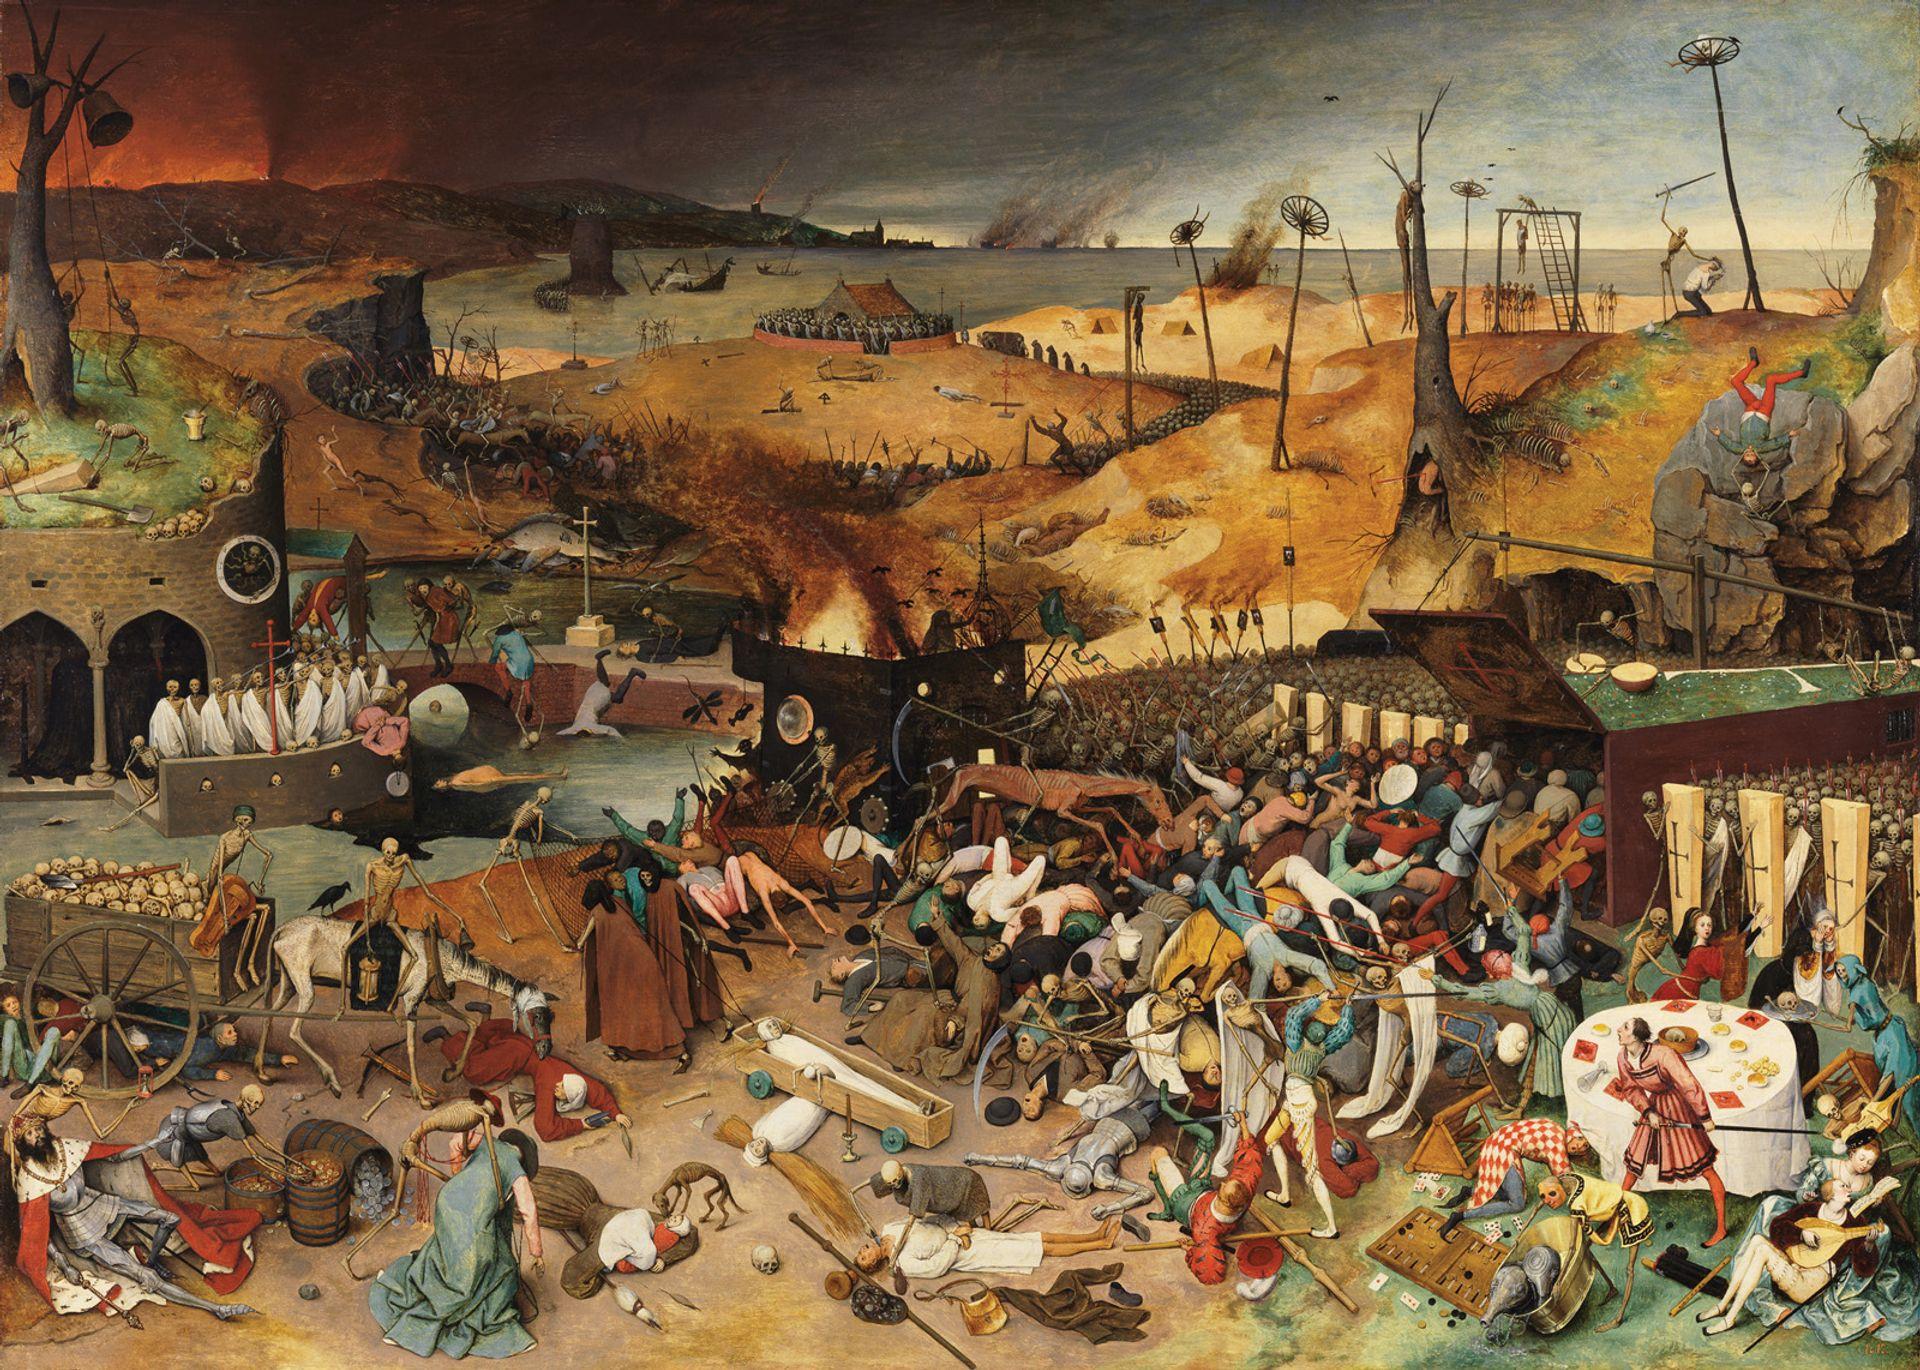 Pieter Bruegel the Elder's The Triumph of Death (1562-63) can be seen at the Kunsthistorisches Museum © Museo Nacional del Prado